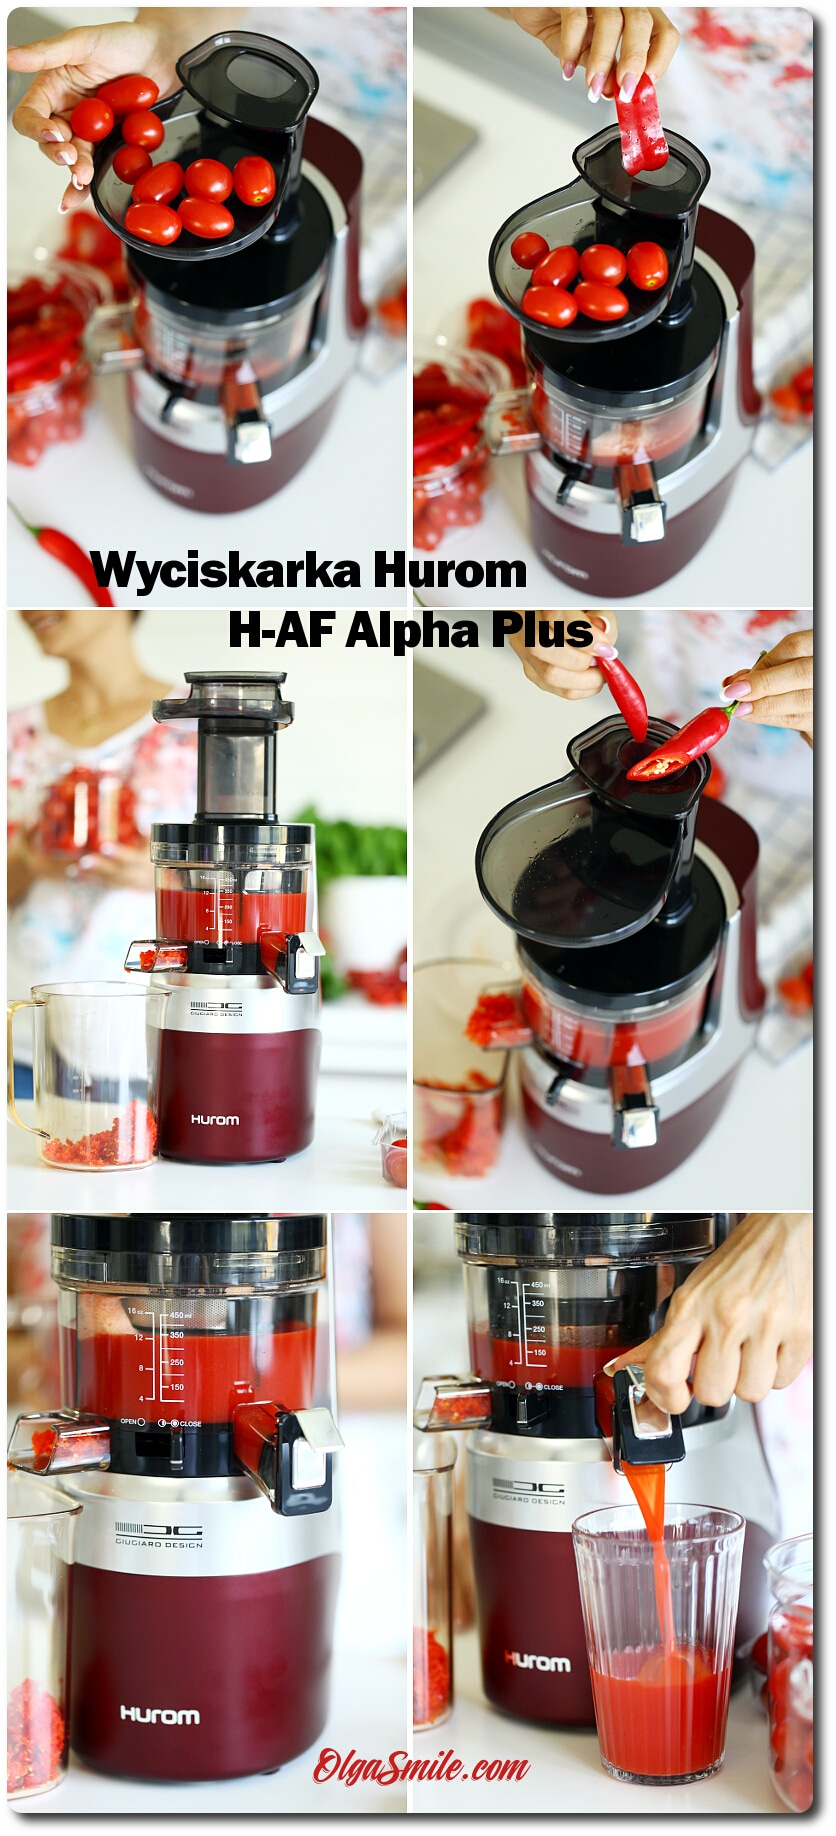 Wyciskarka Hurom H-AF Alpha Plus